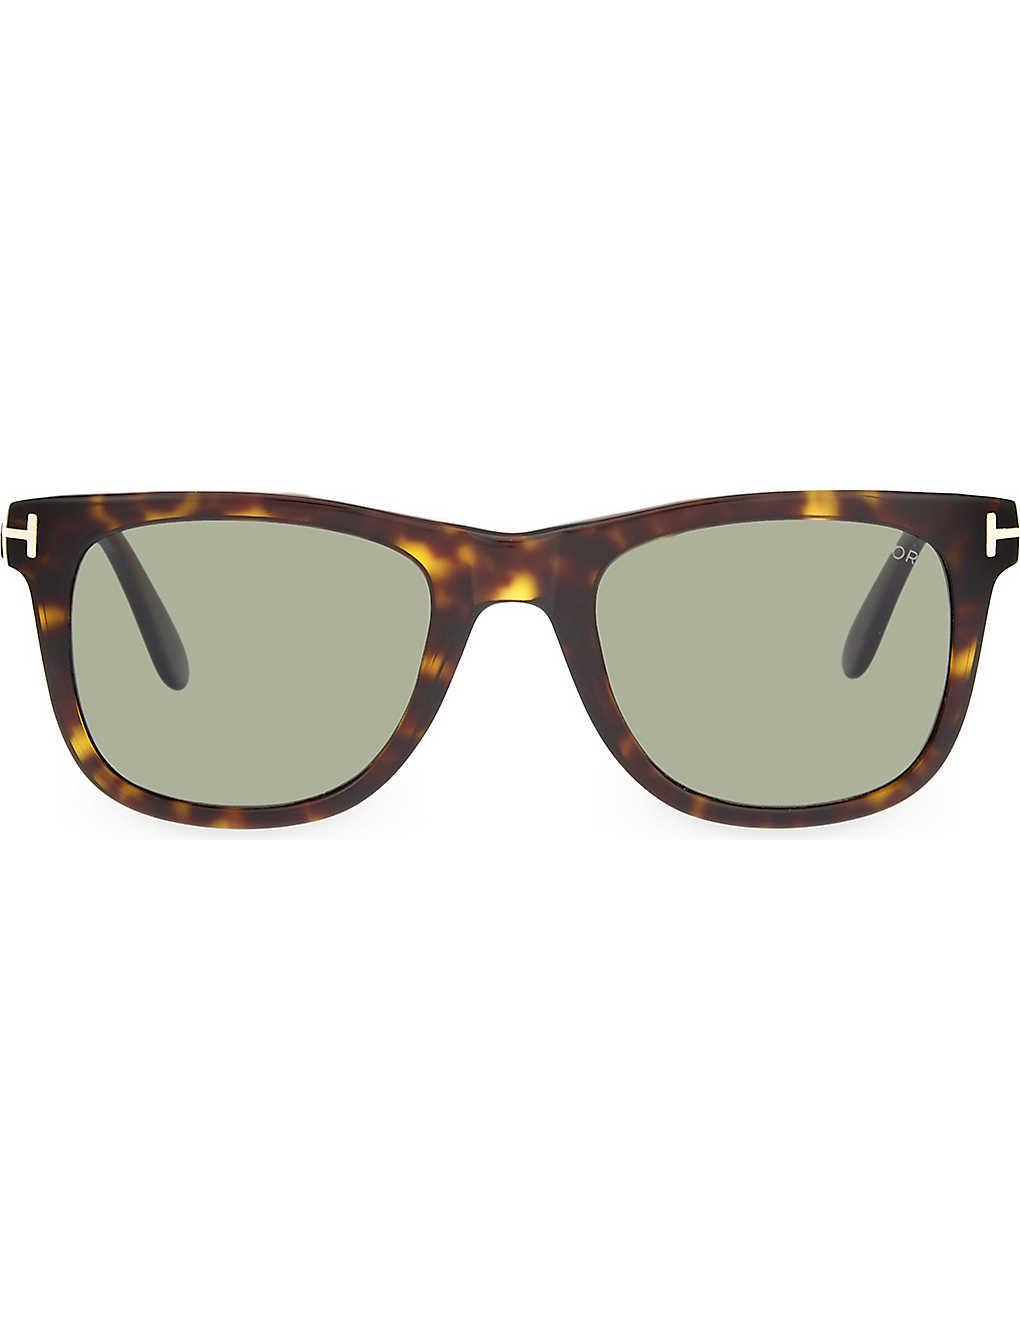 bd75274ac1 TOM FORD - TF336 Leo tortoiseshell square-frame sunglasses ...